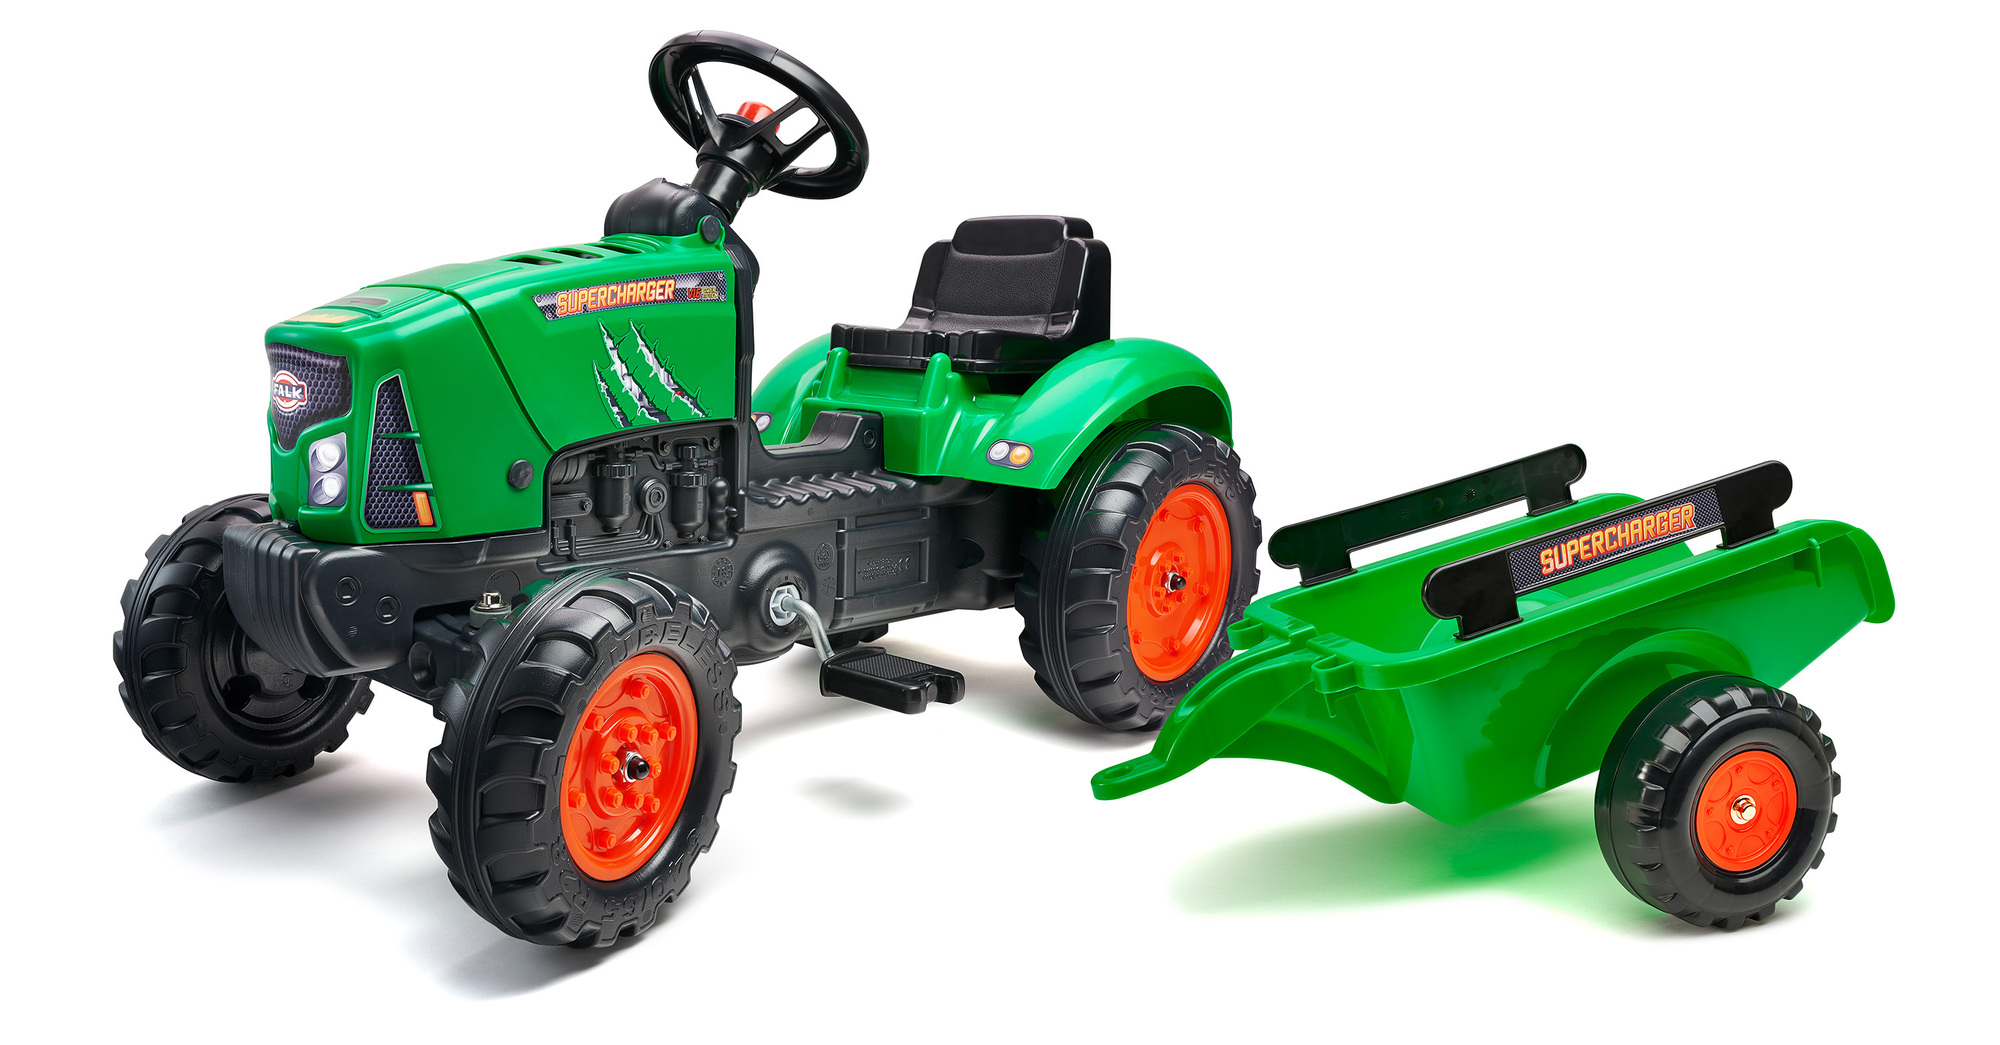 FALK Šliapací traktor 2031AB SuperCharger s vlečkou a otváracou kapotou